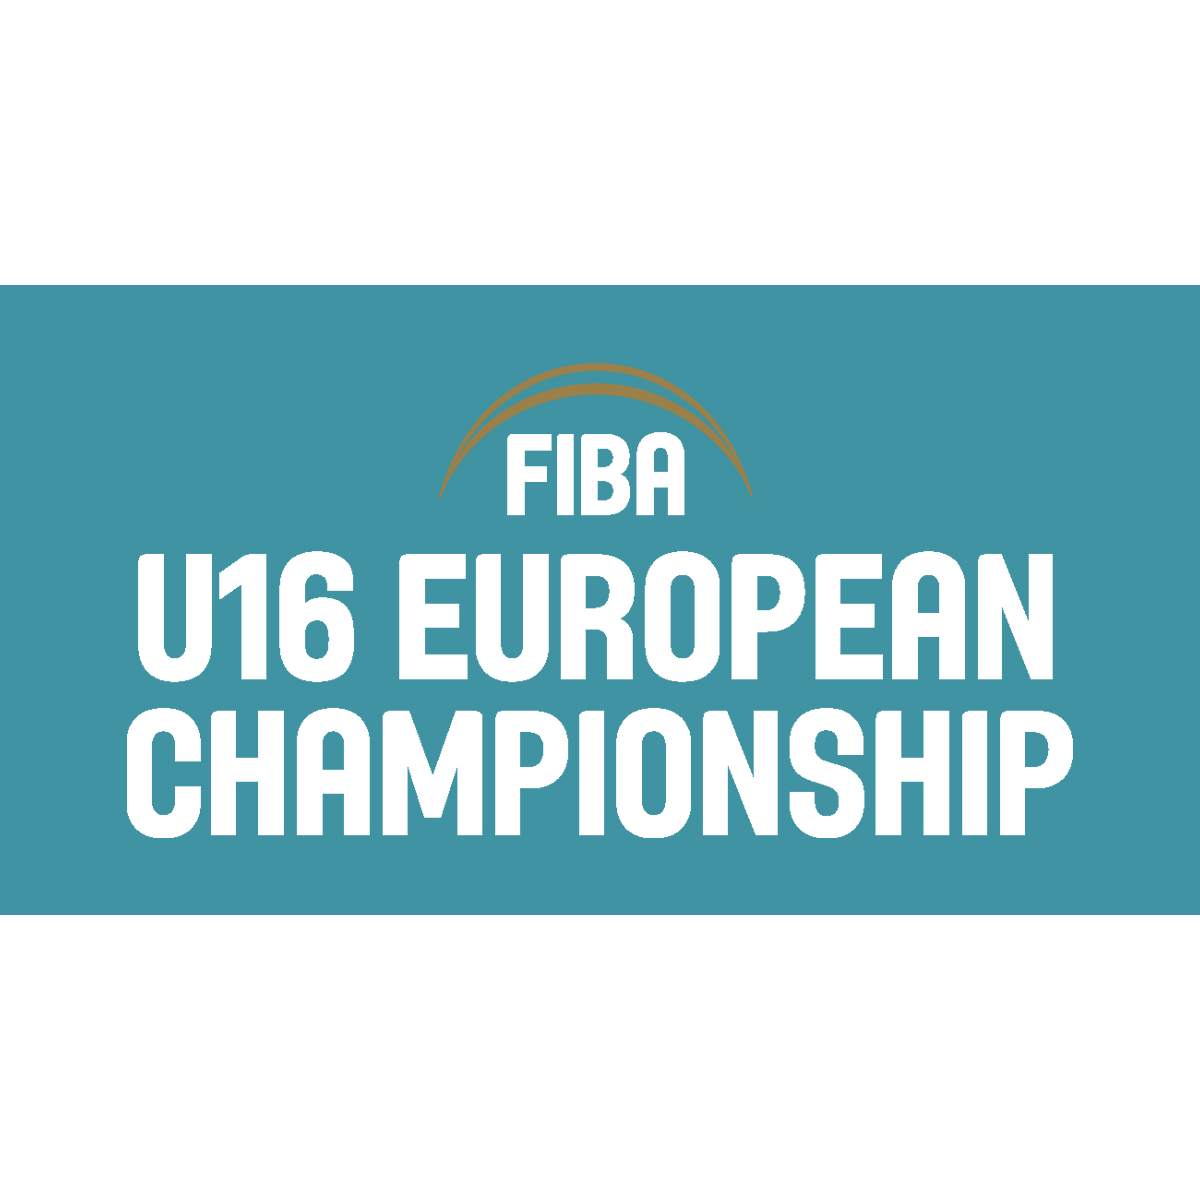 2014 FIBA U16 European Basketball Championship - Division B